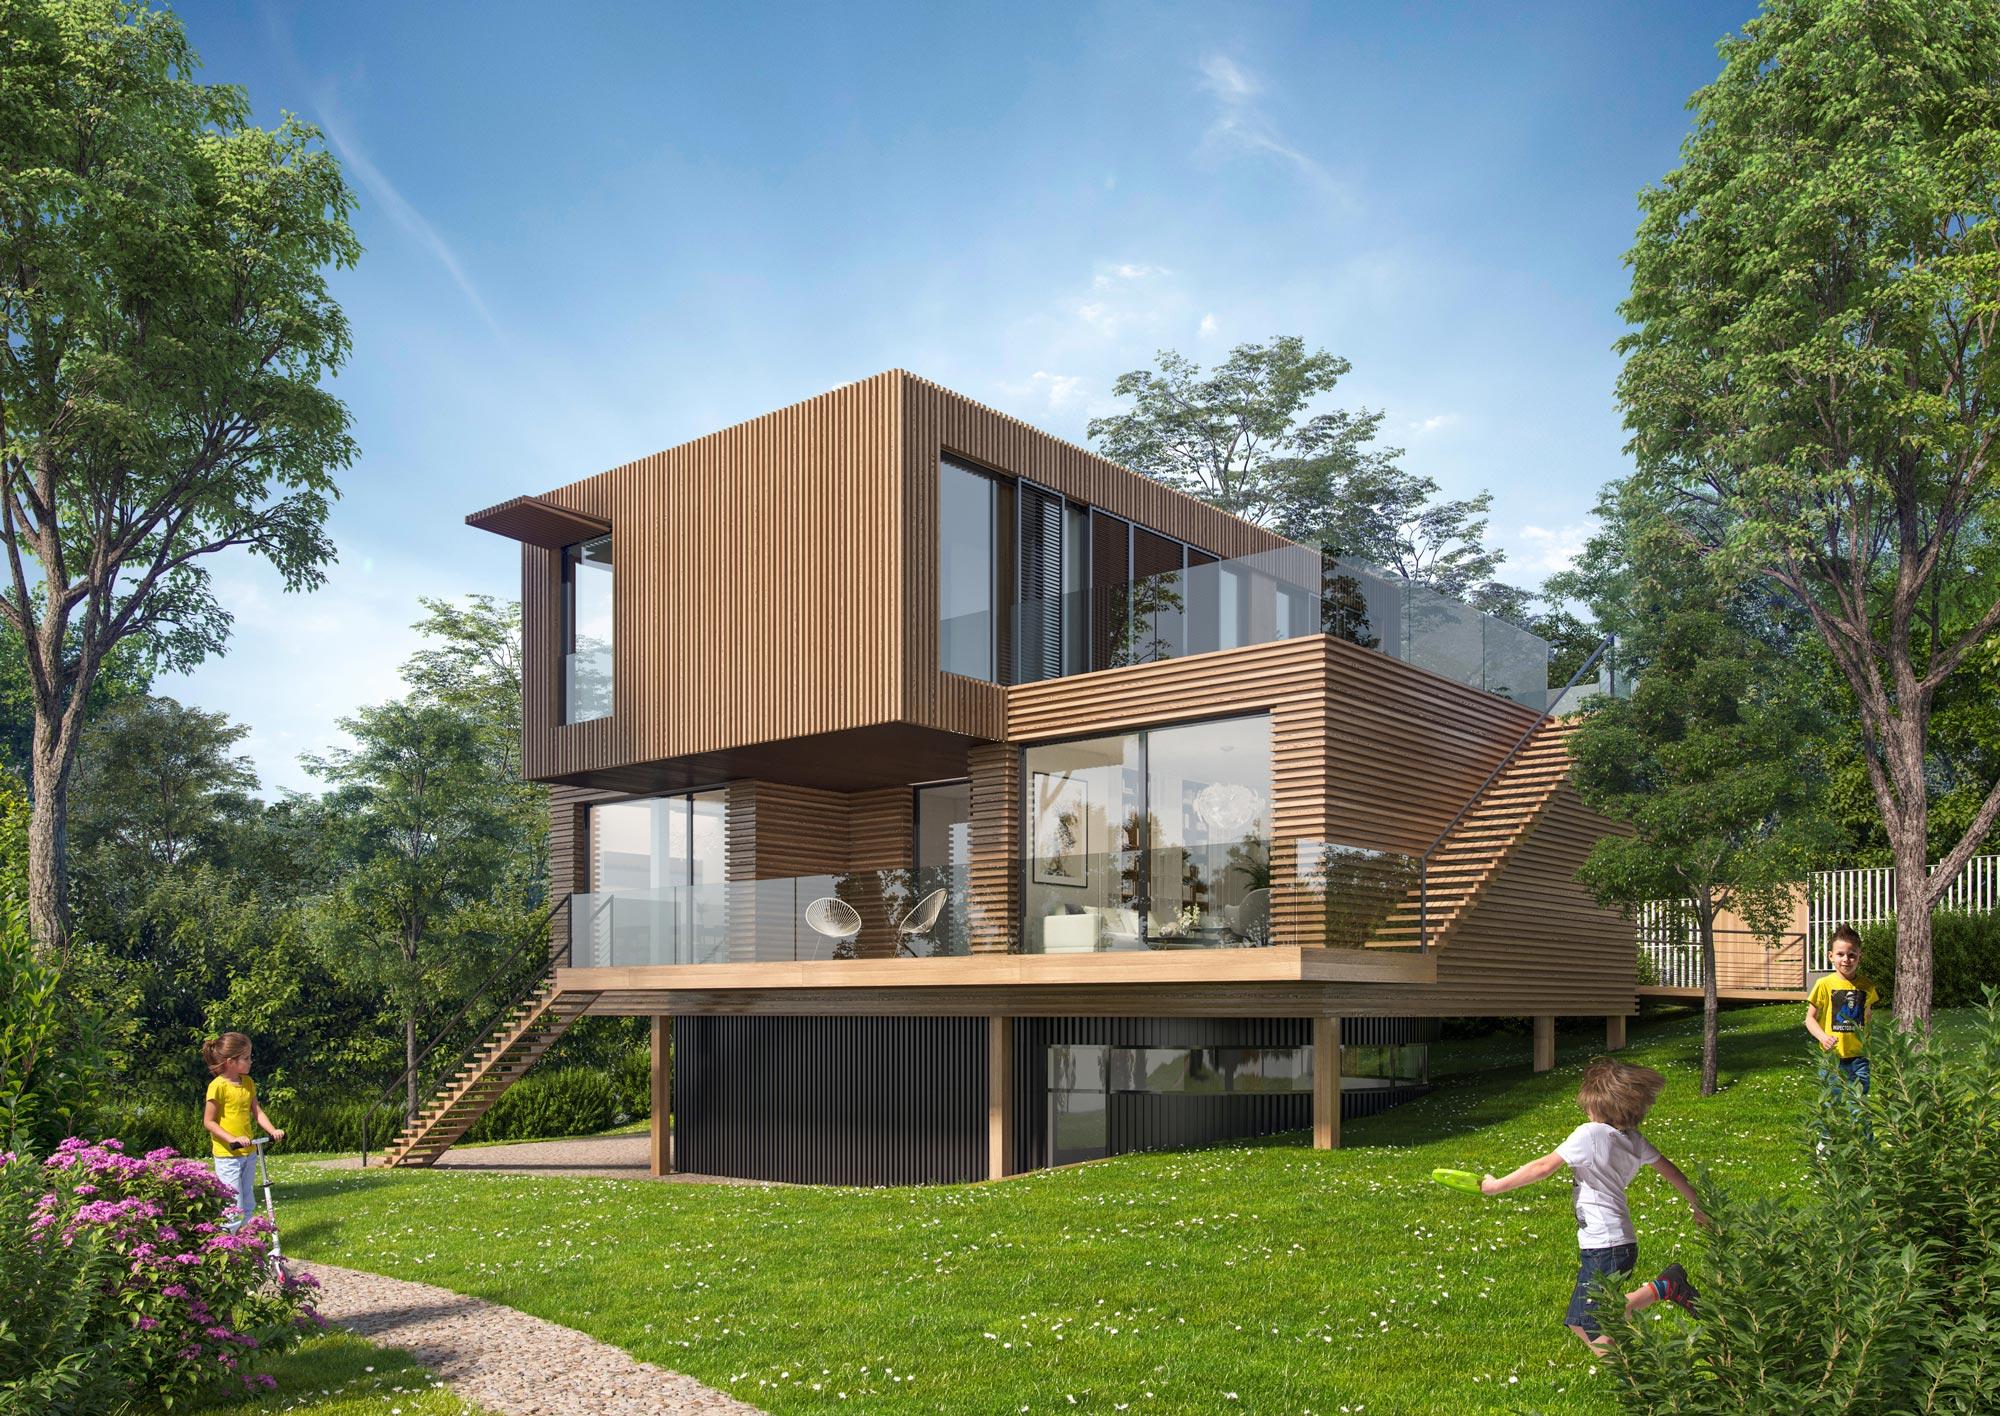 Single-Family House | France